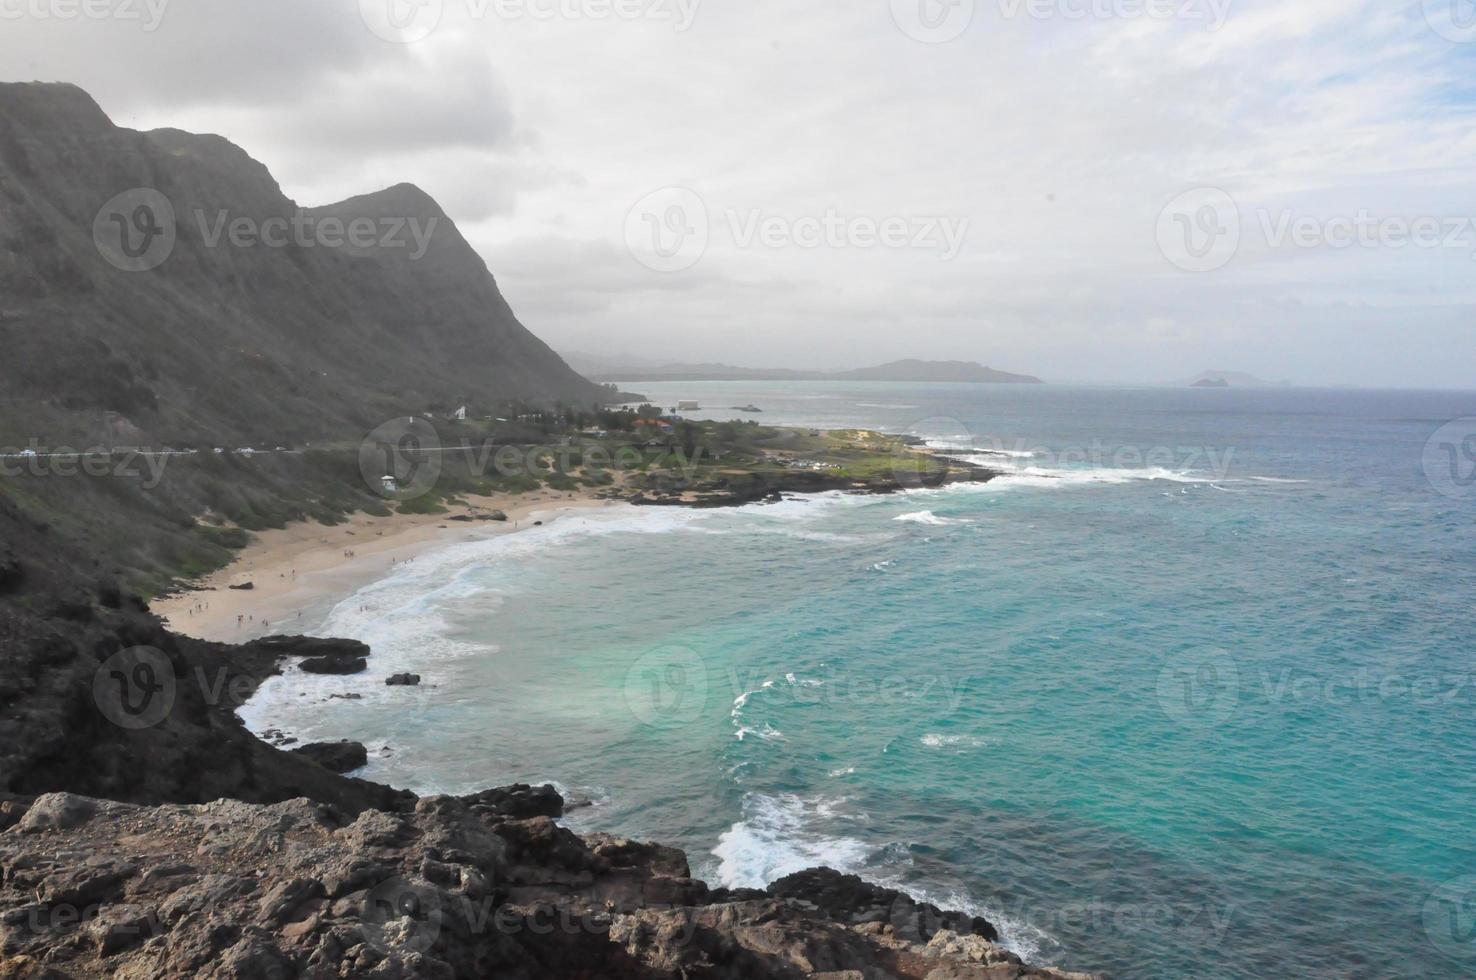 makapuu-utkik i oahu, hawaii foto